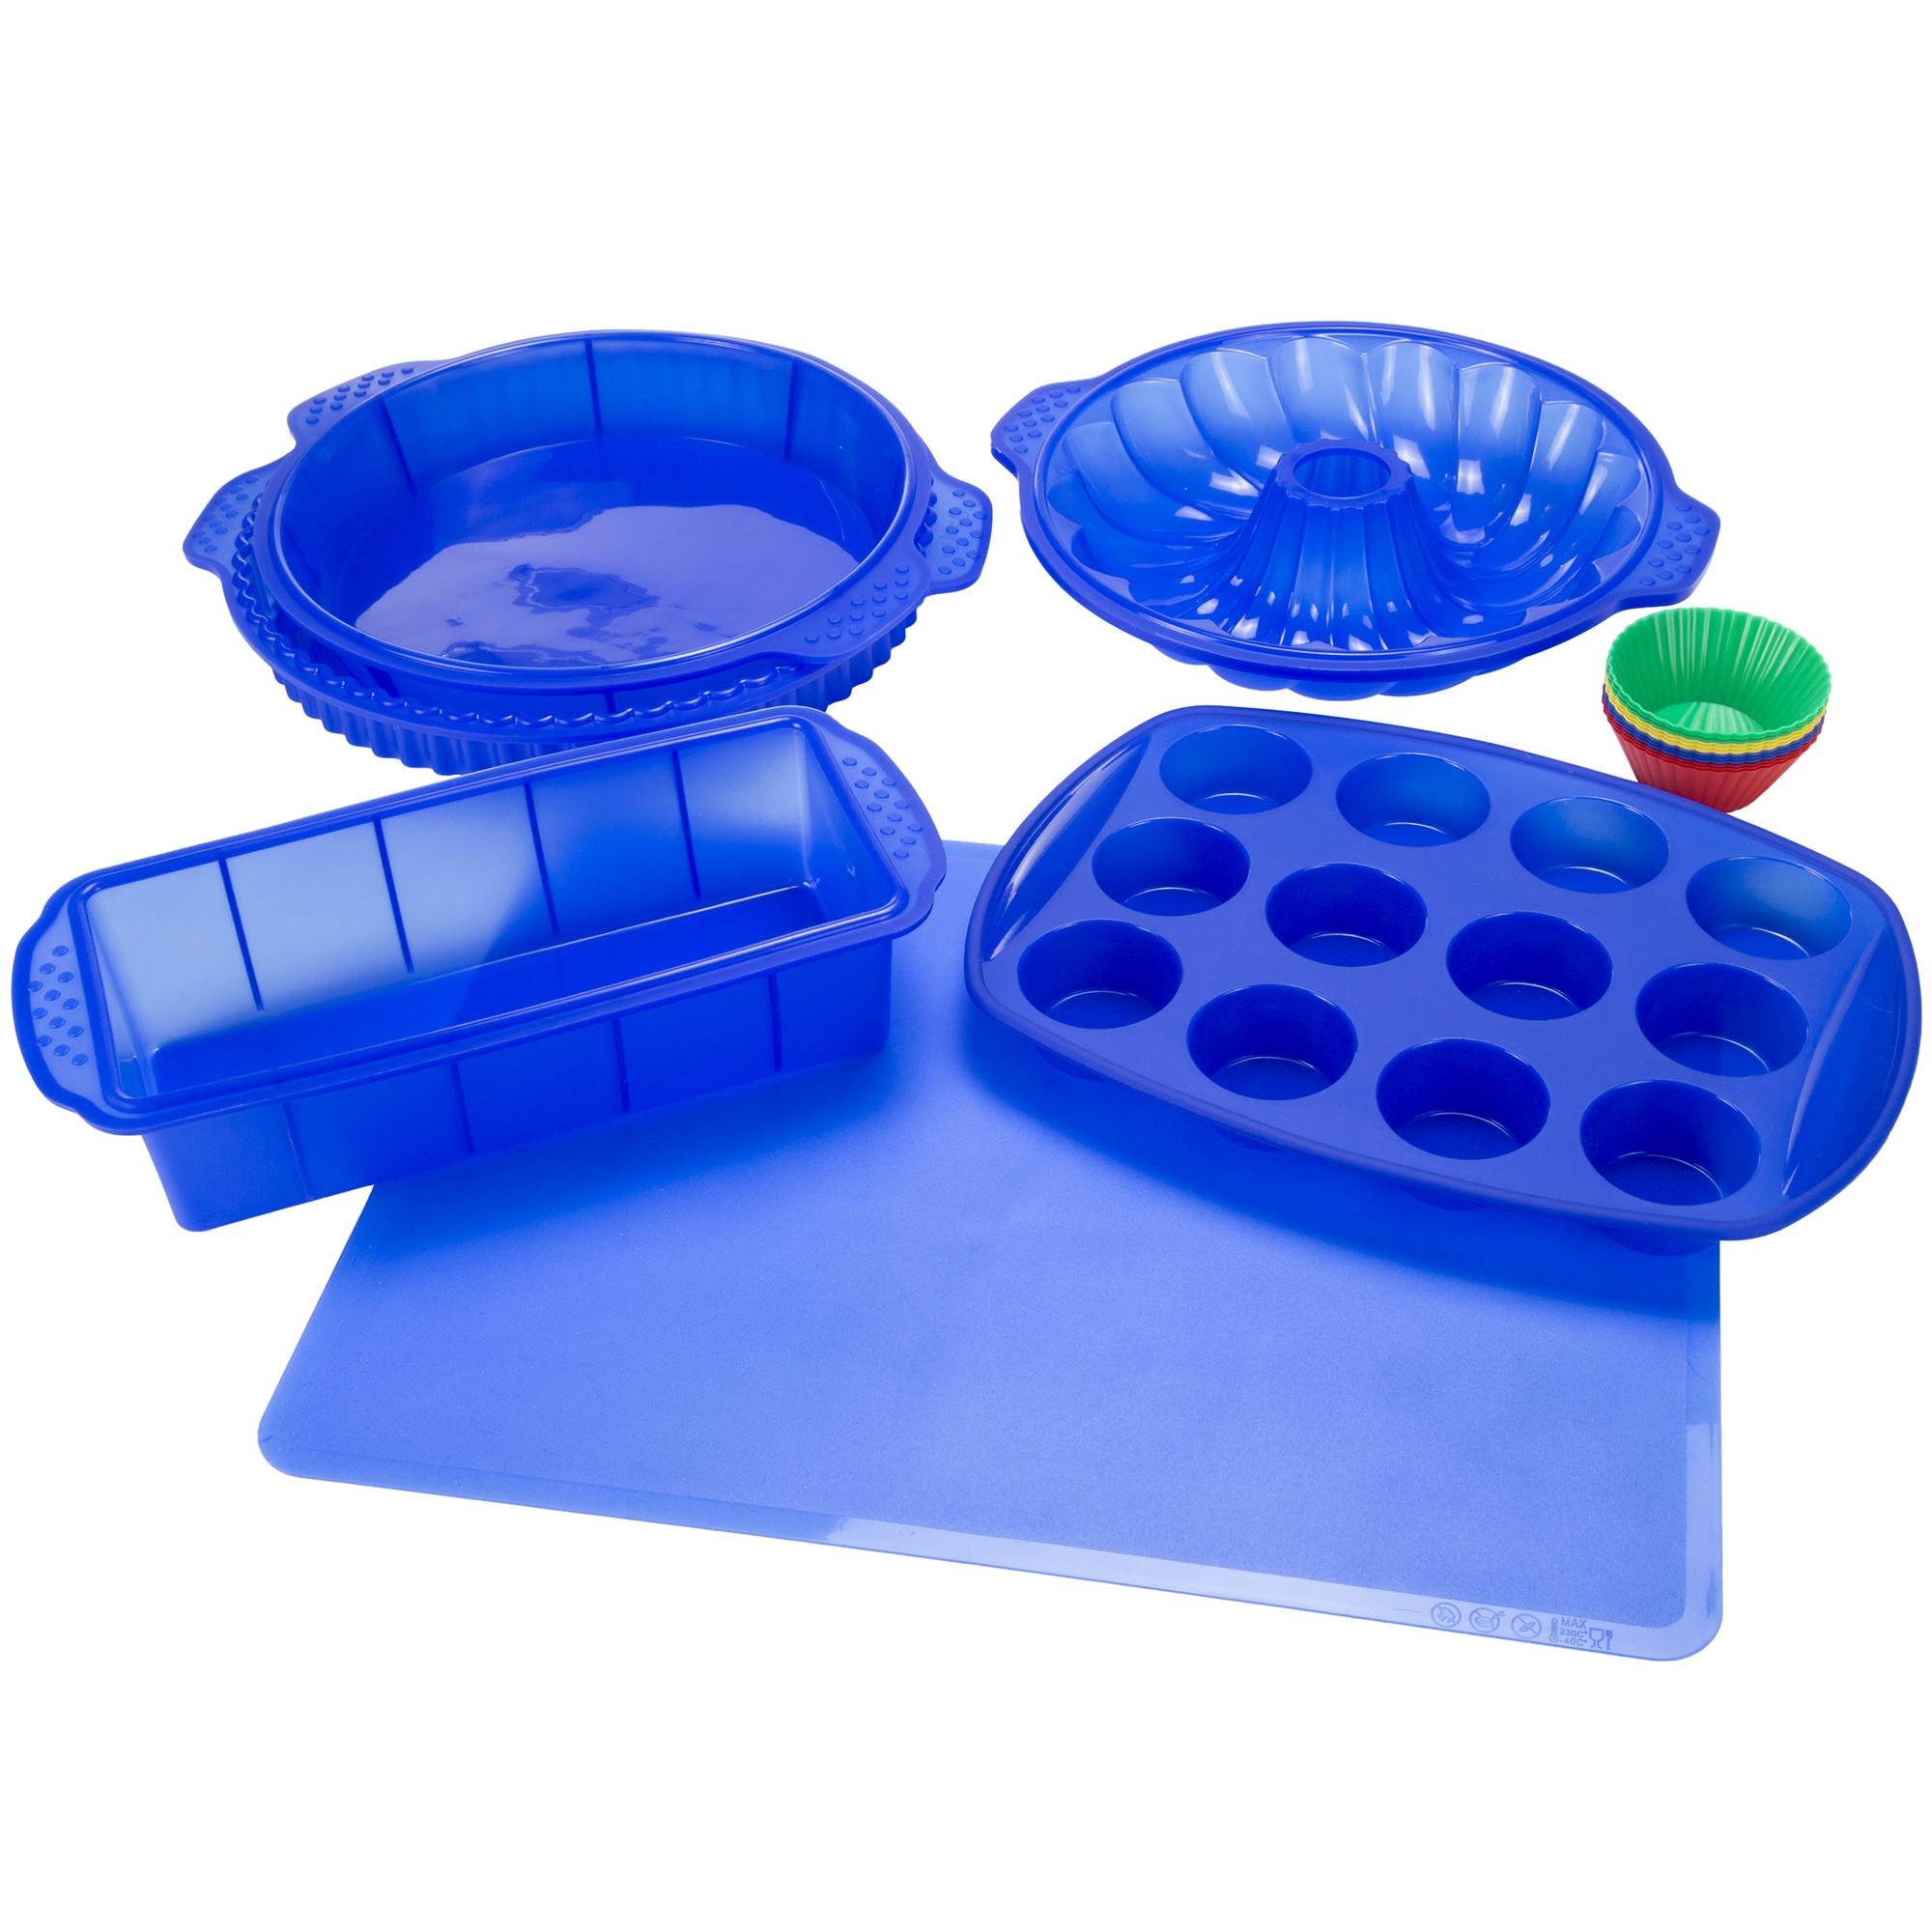 Classic Cuisine 18 Piece Silicone Bakeware Set - Blue